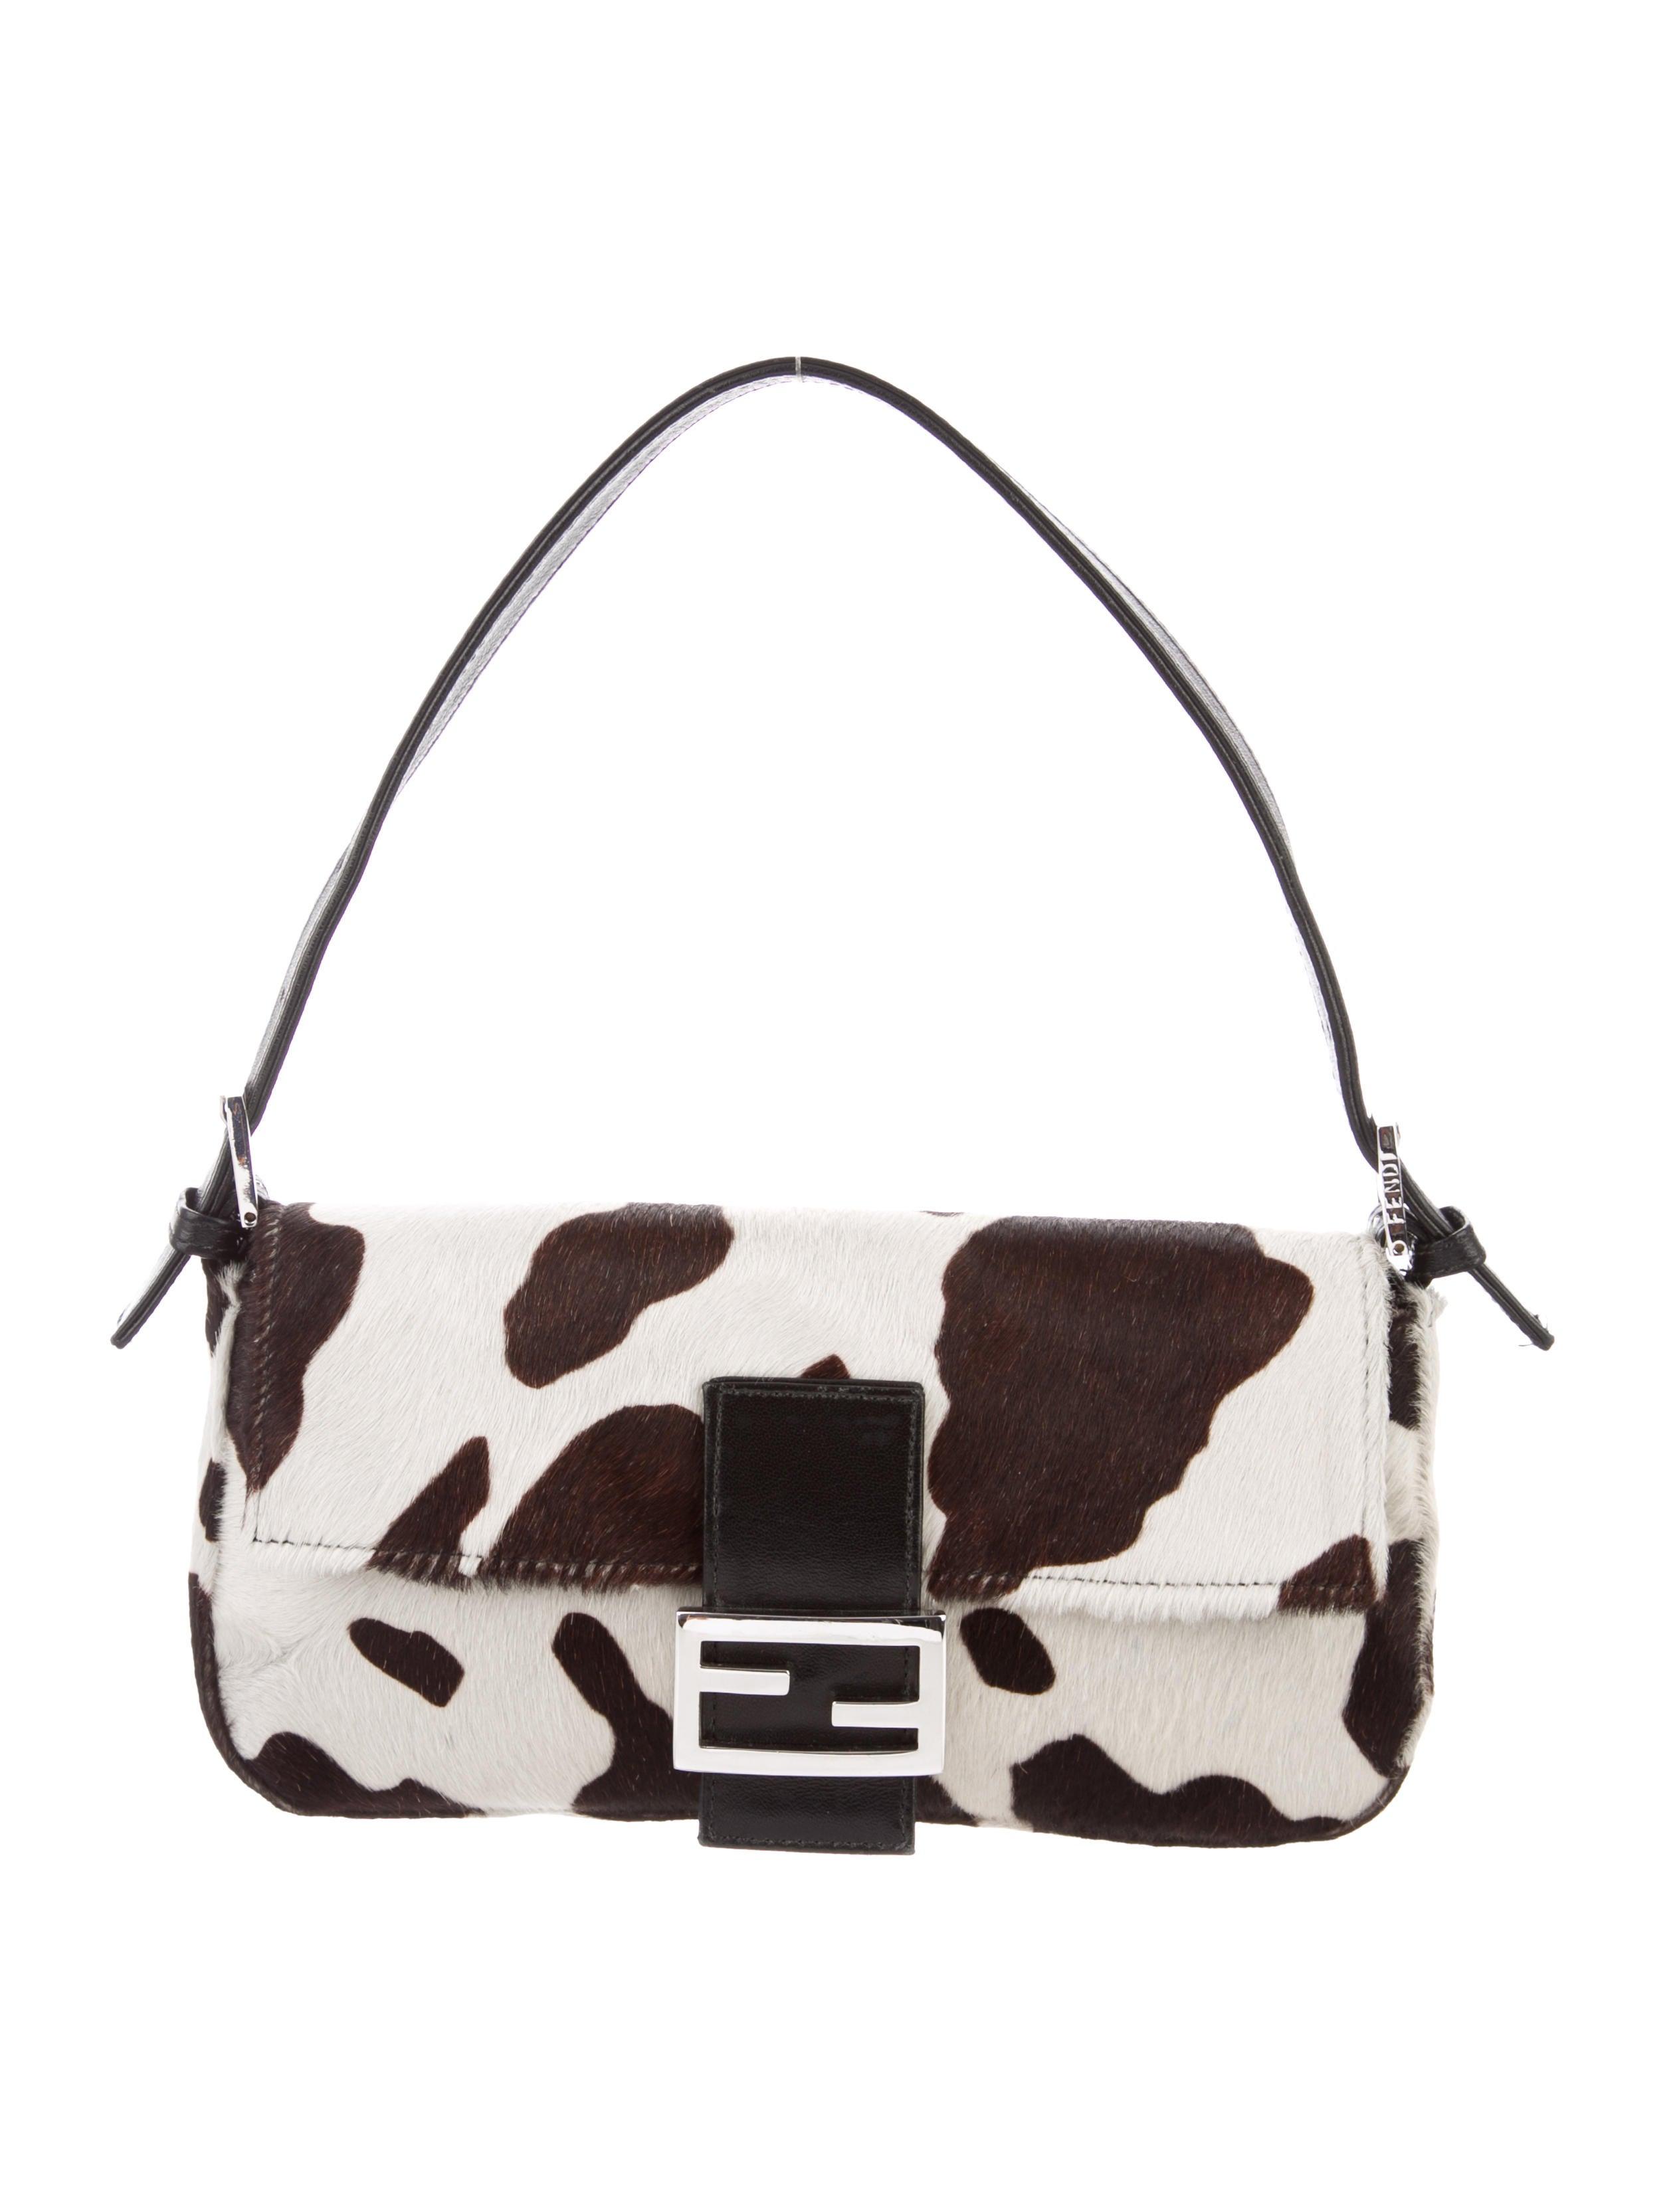 7ab7993dec2 Animal Fendi Fendi Ponyhair Baguette Animal Print HEpw5wYq in ...